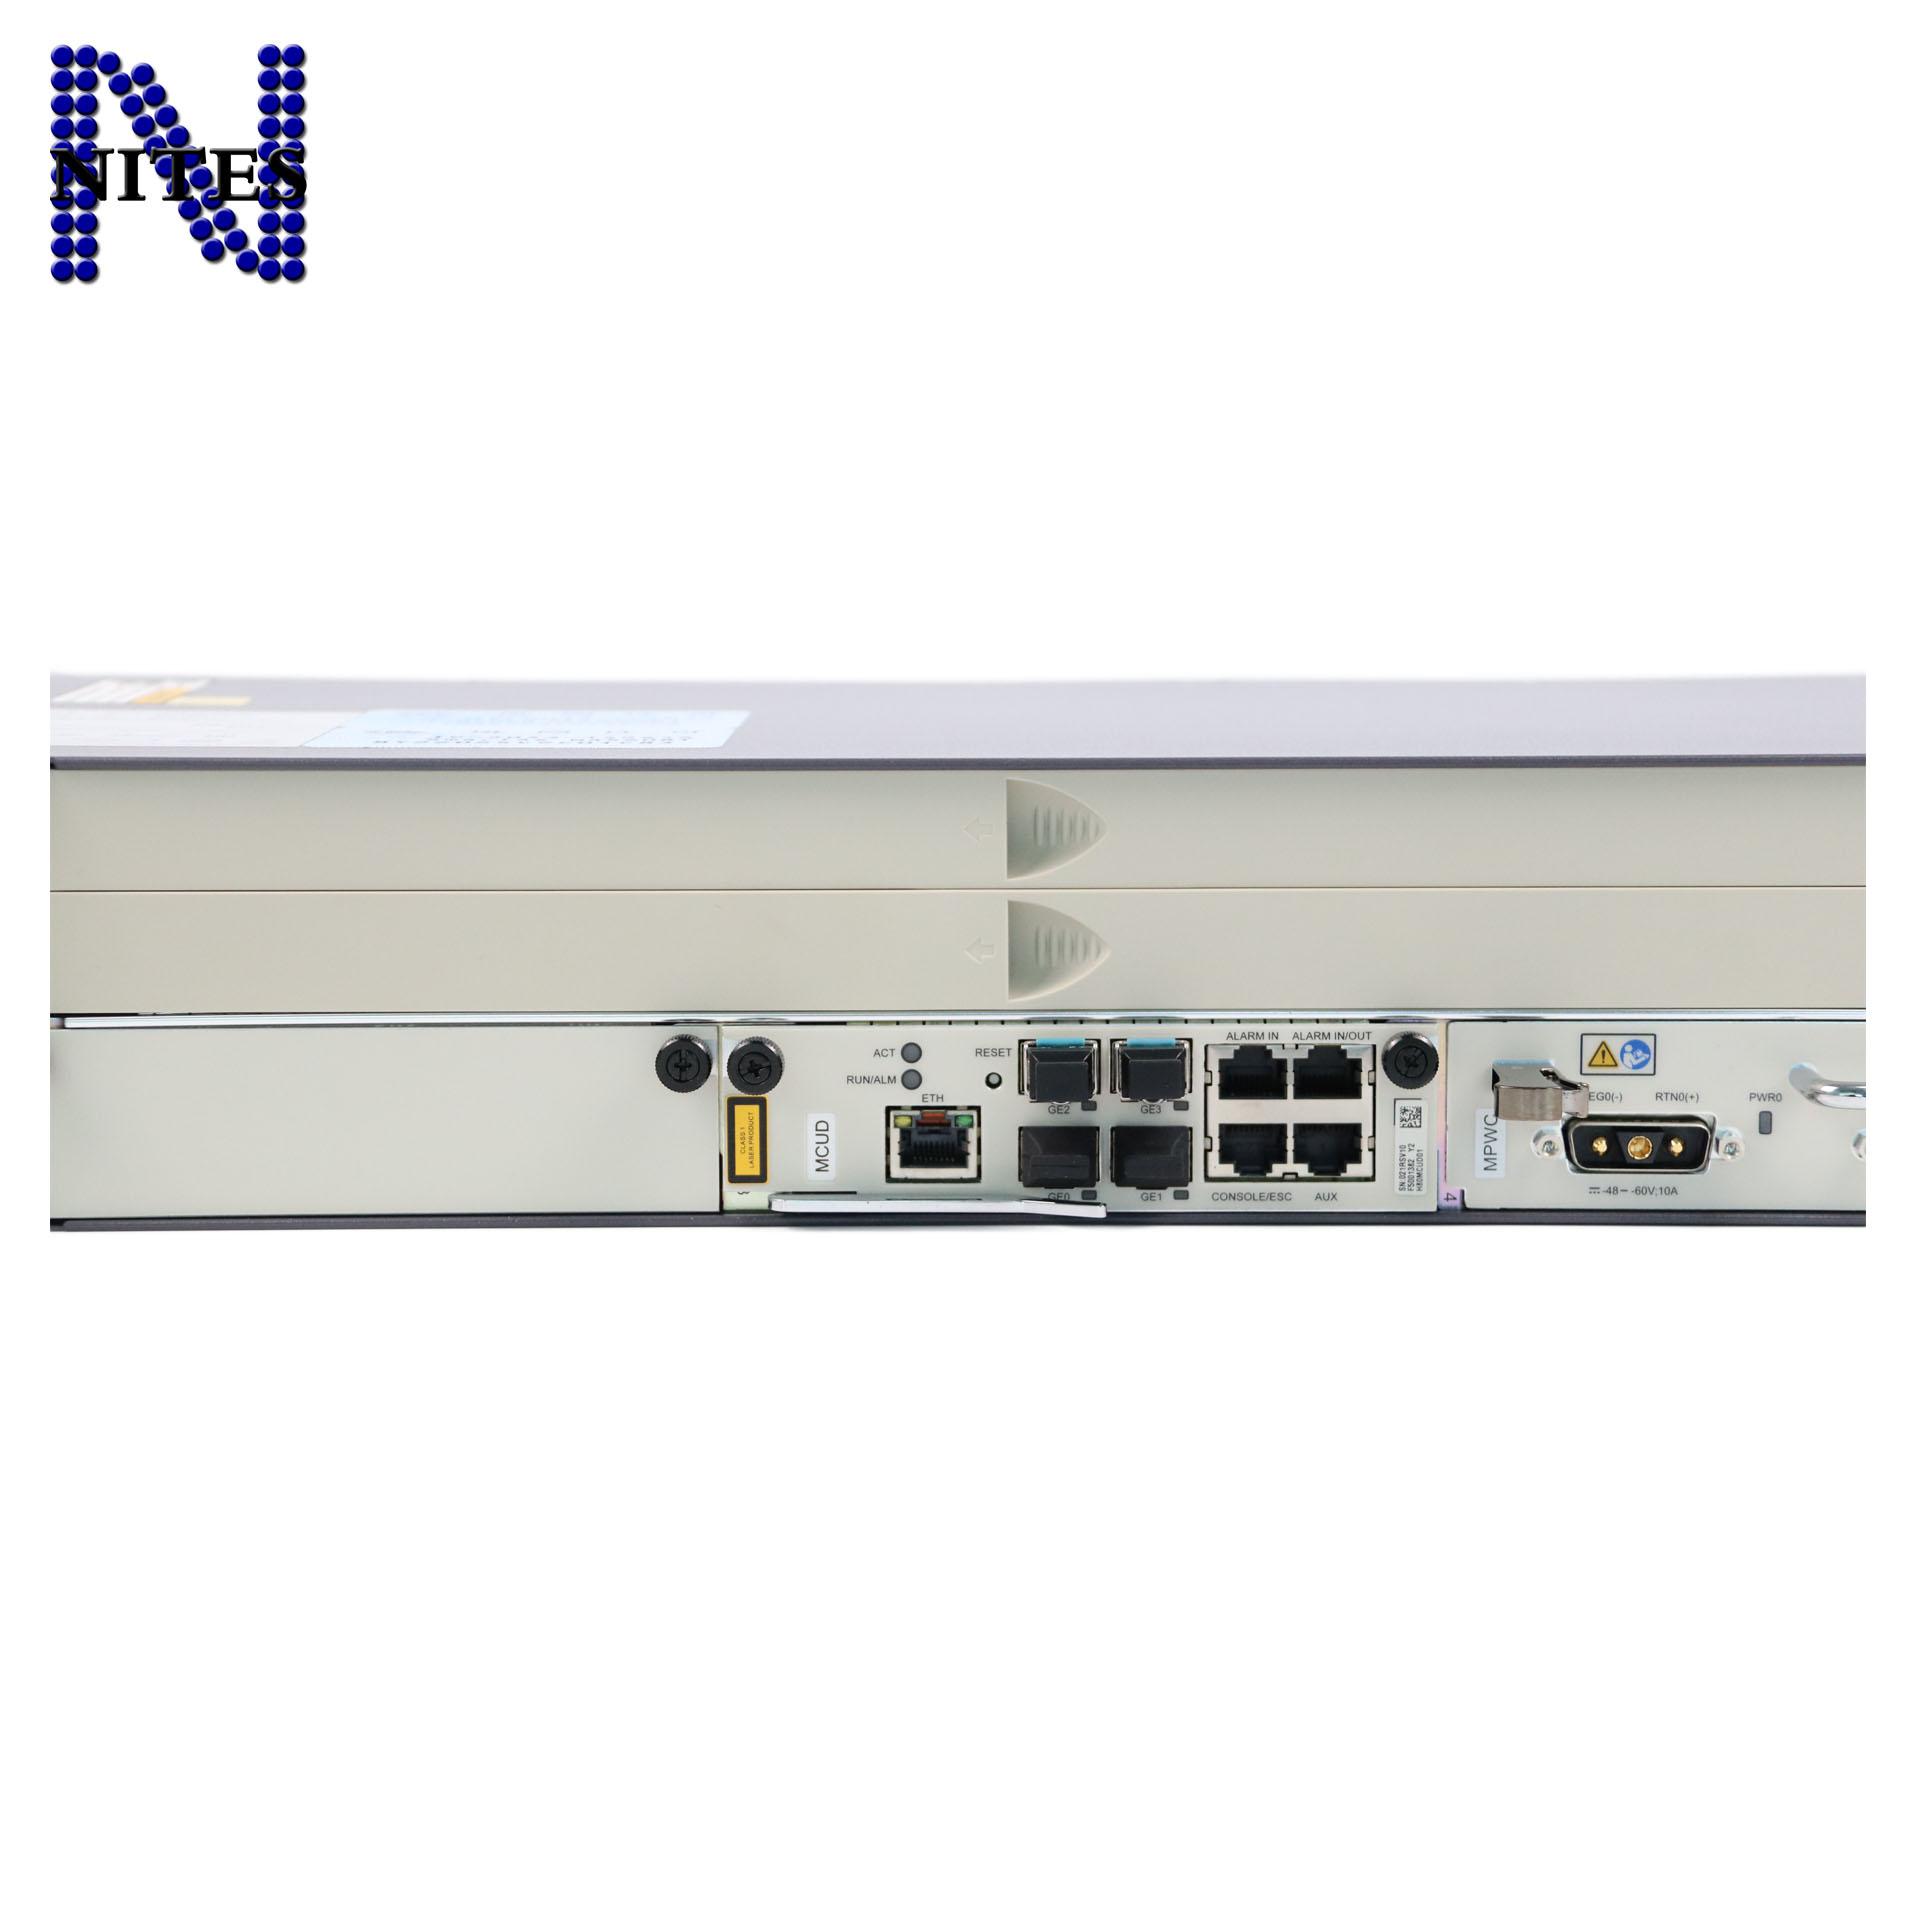 Ma5608t Olt Original Hua Wei 16 Ports Gpon Board With 16 Pcs Gpfd Class C Ma5683t Sfp Modules For Ma5680t